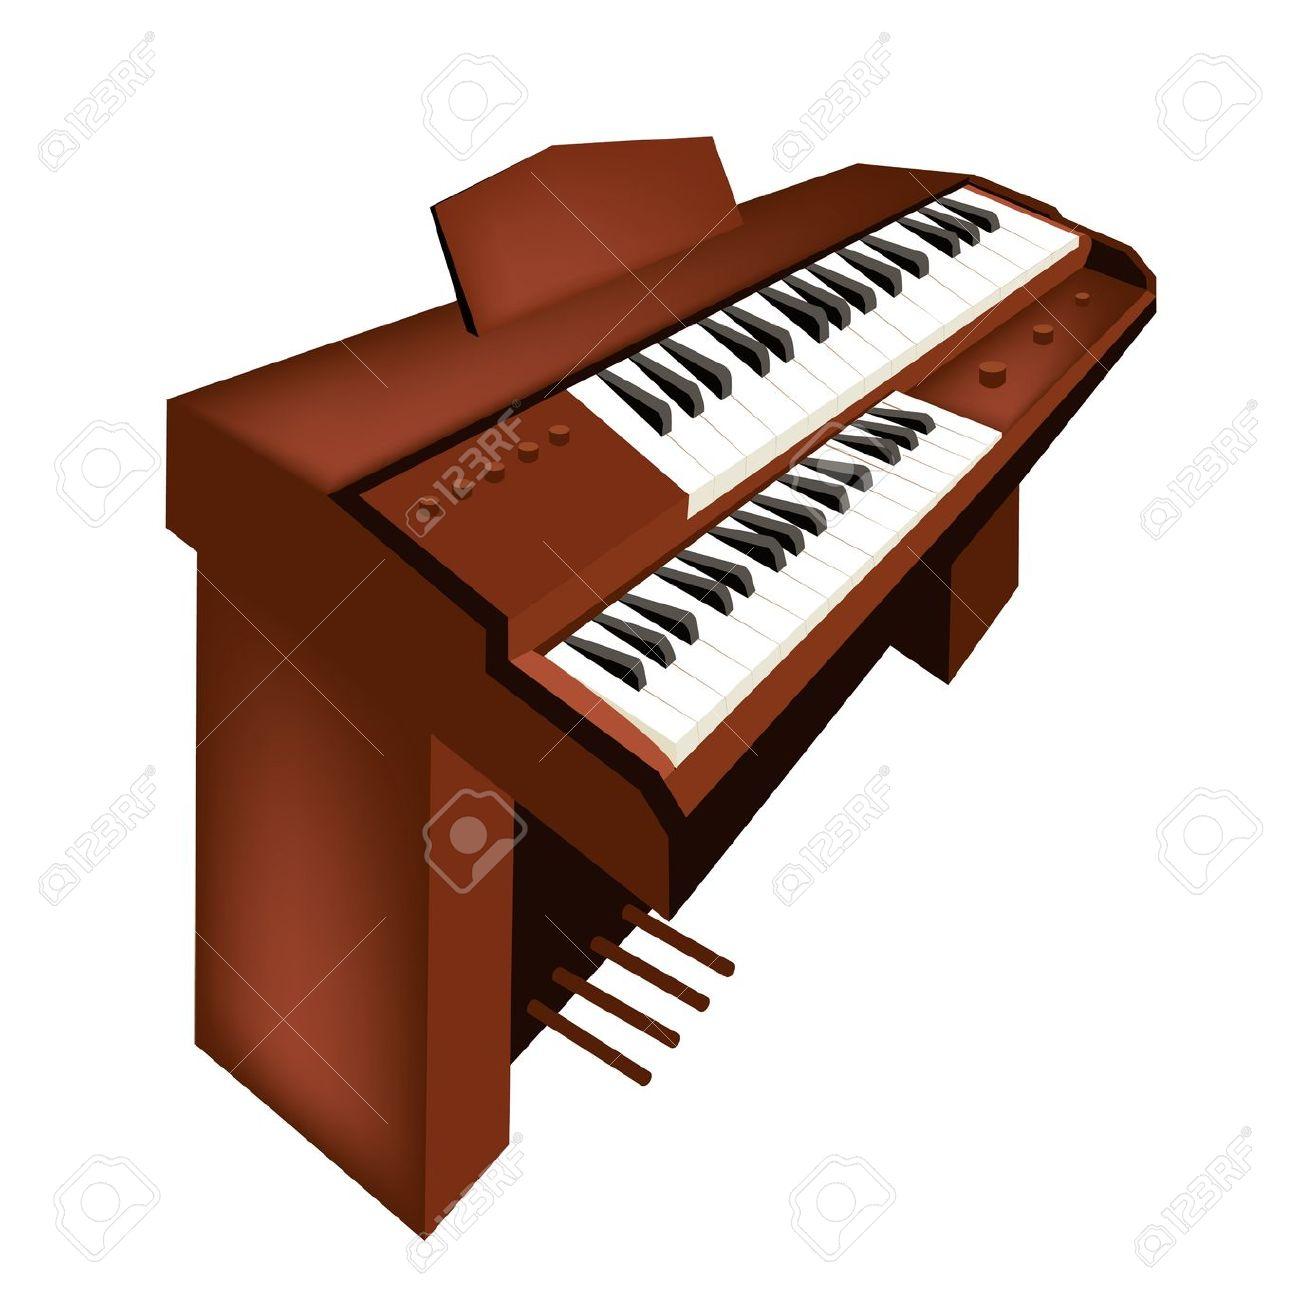 Organ clipart - Clipground